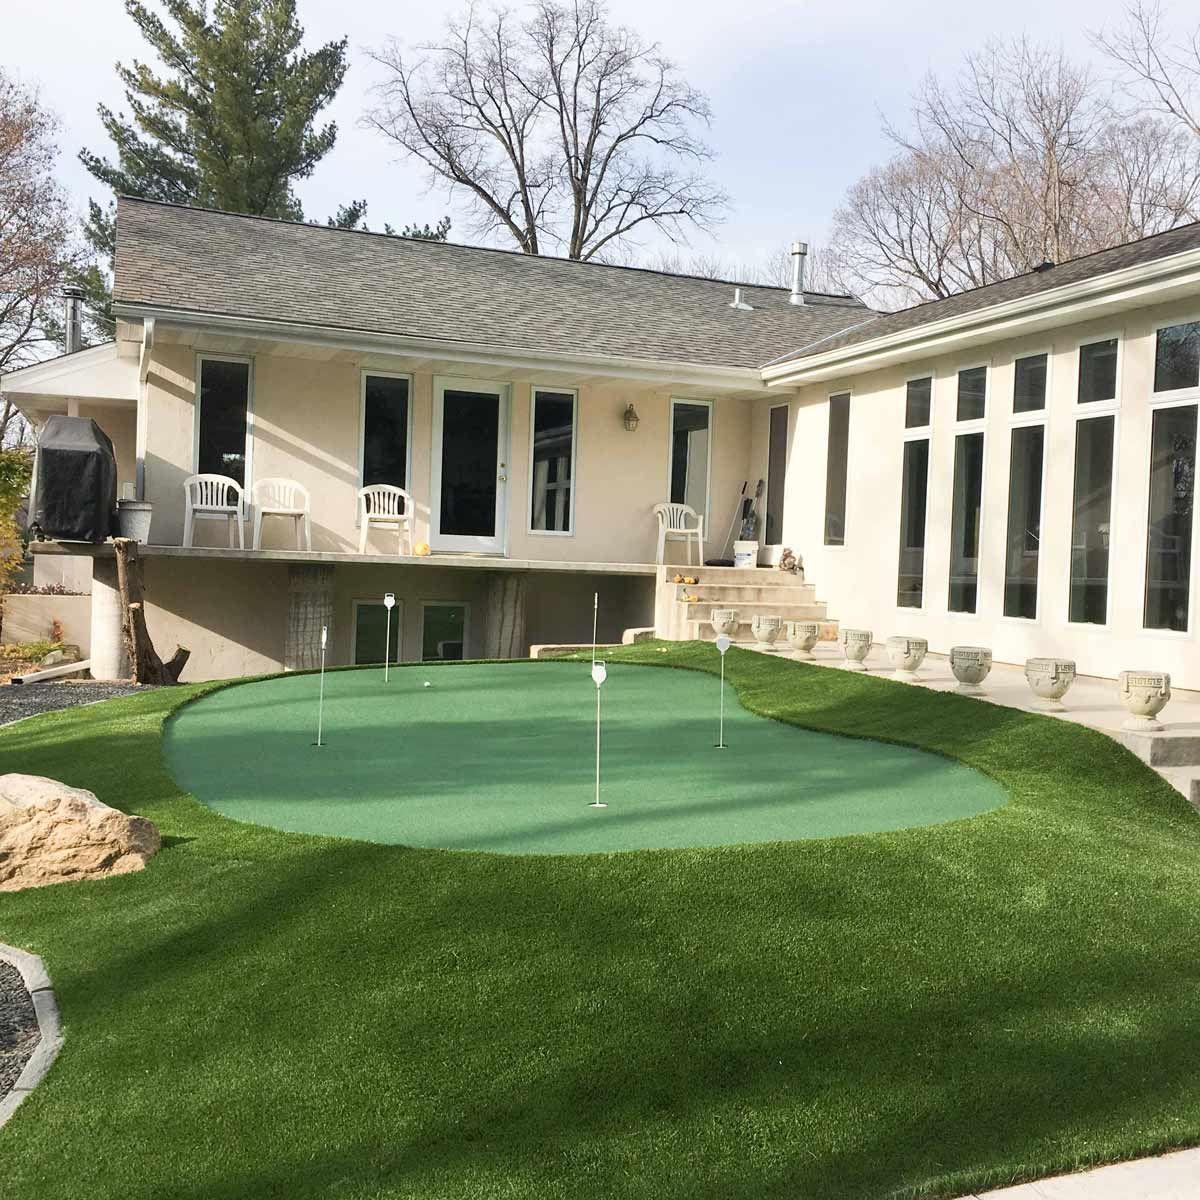 19 crazy cool backyard putting greens in 2020 backyard